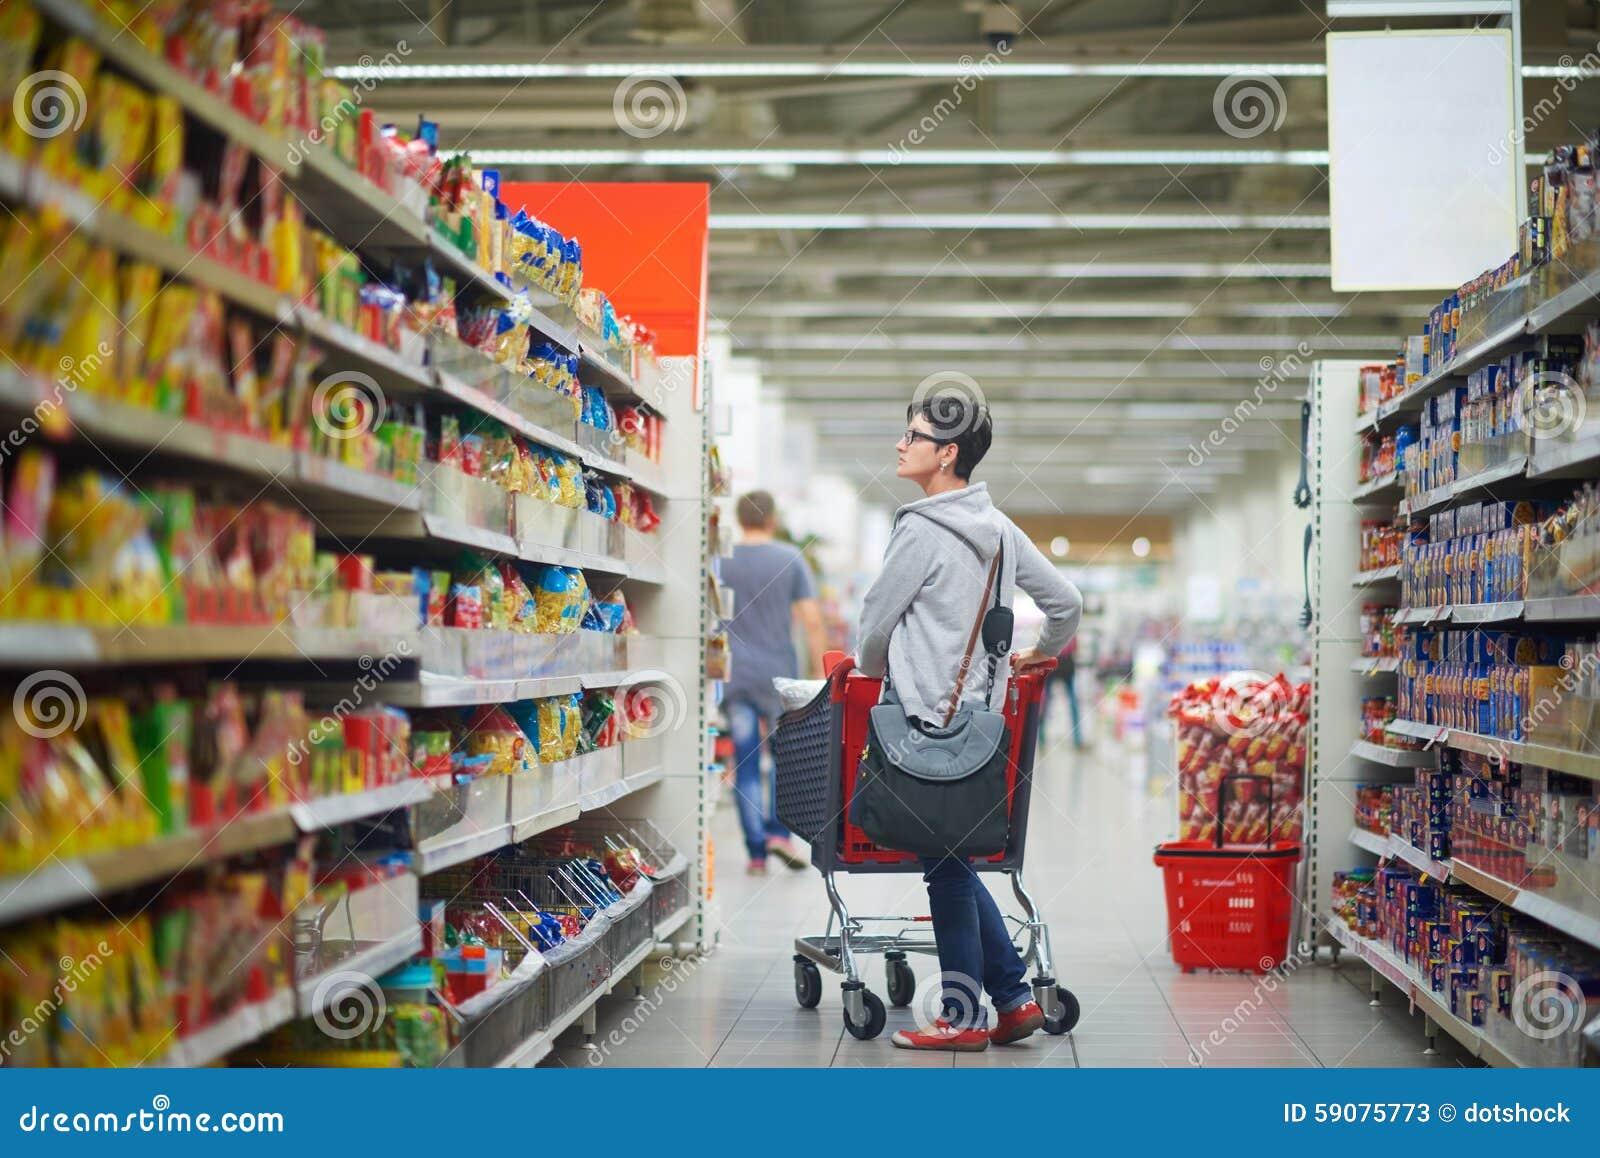 Frau Kackt In Supermarkt